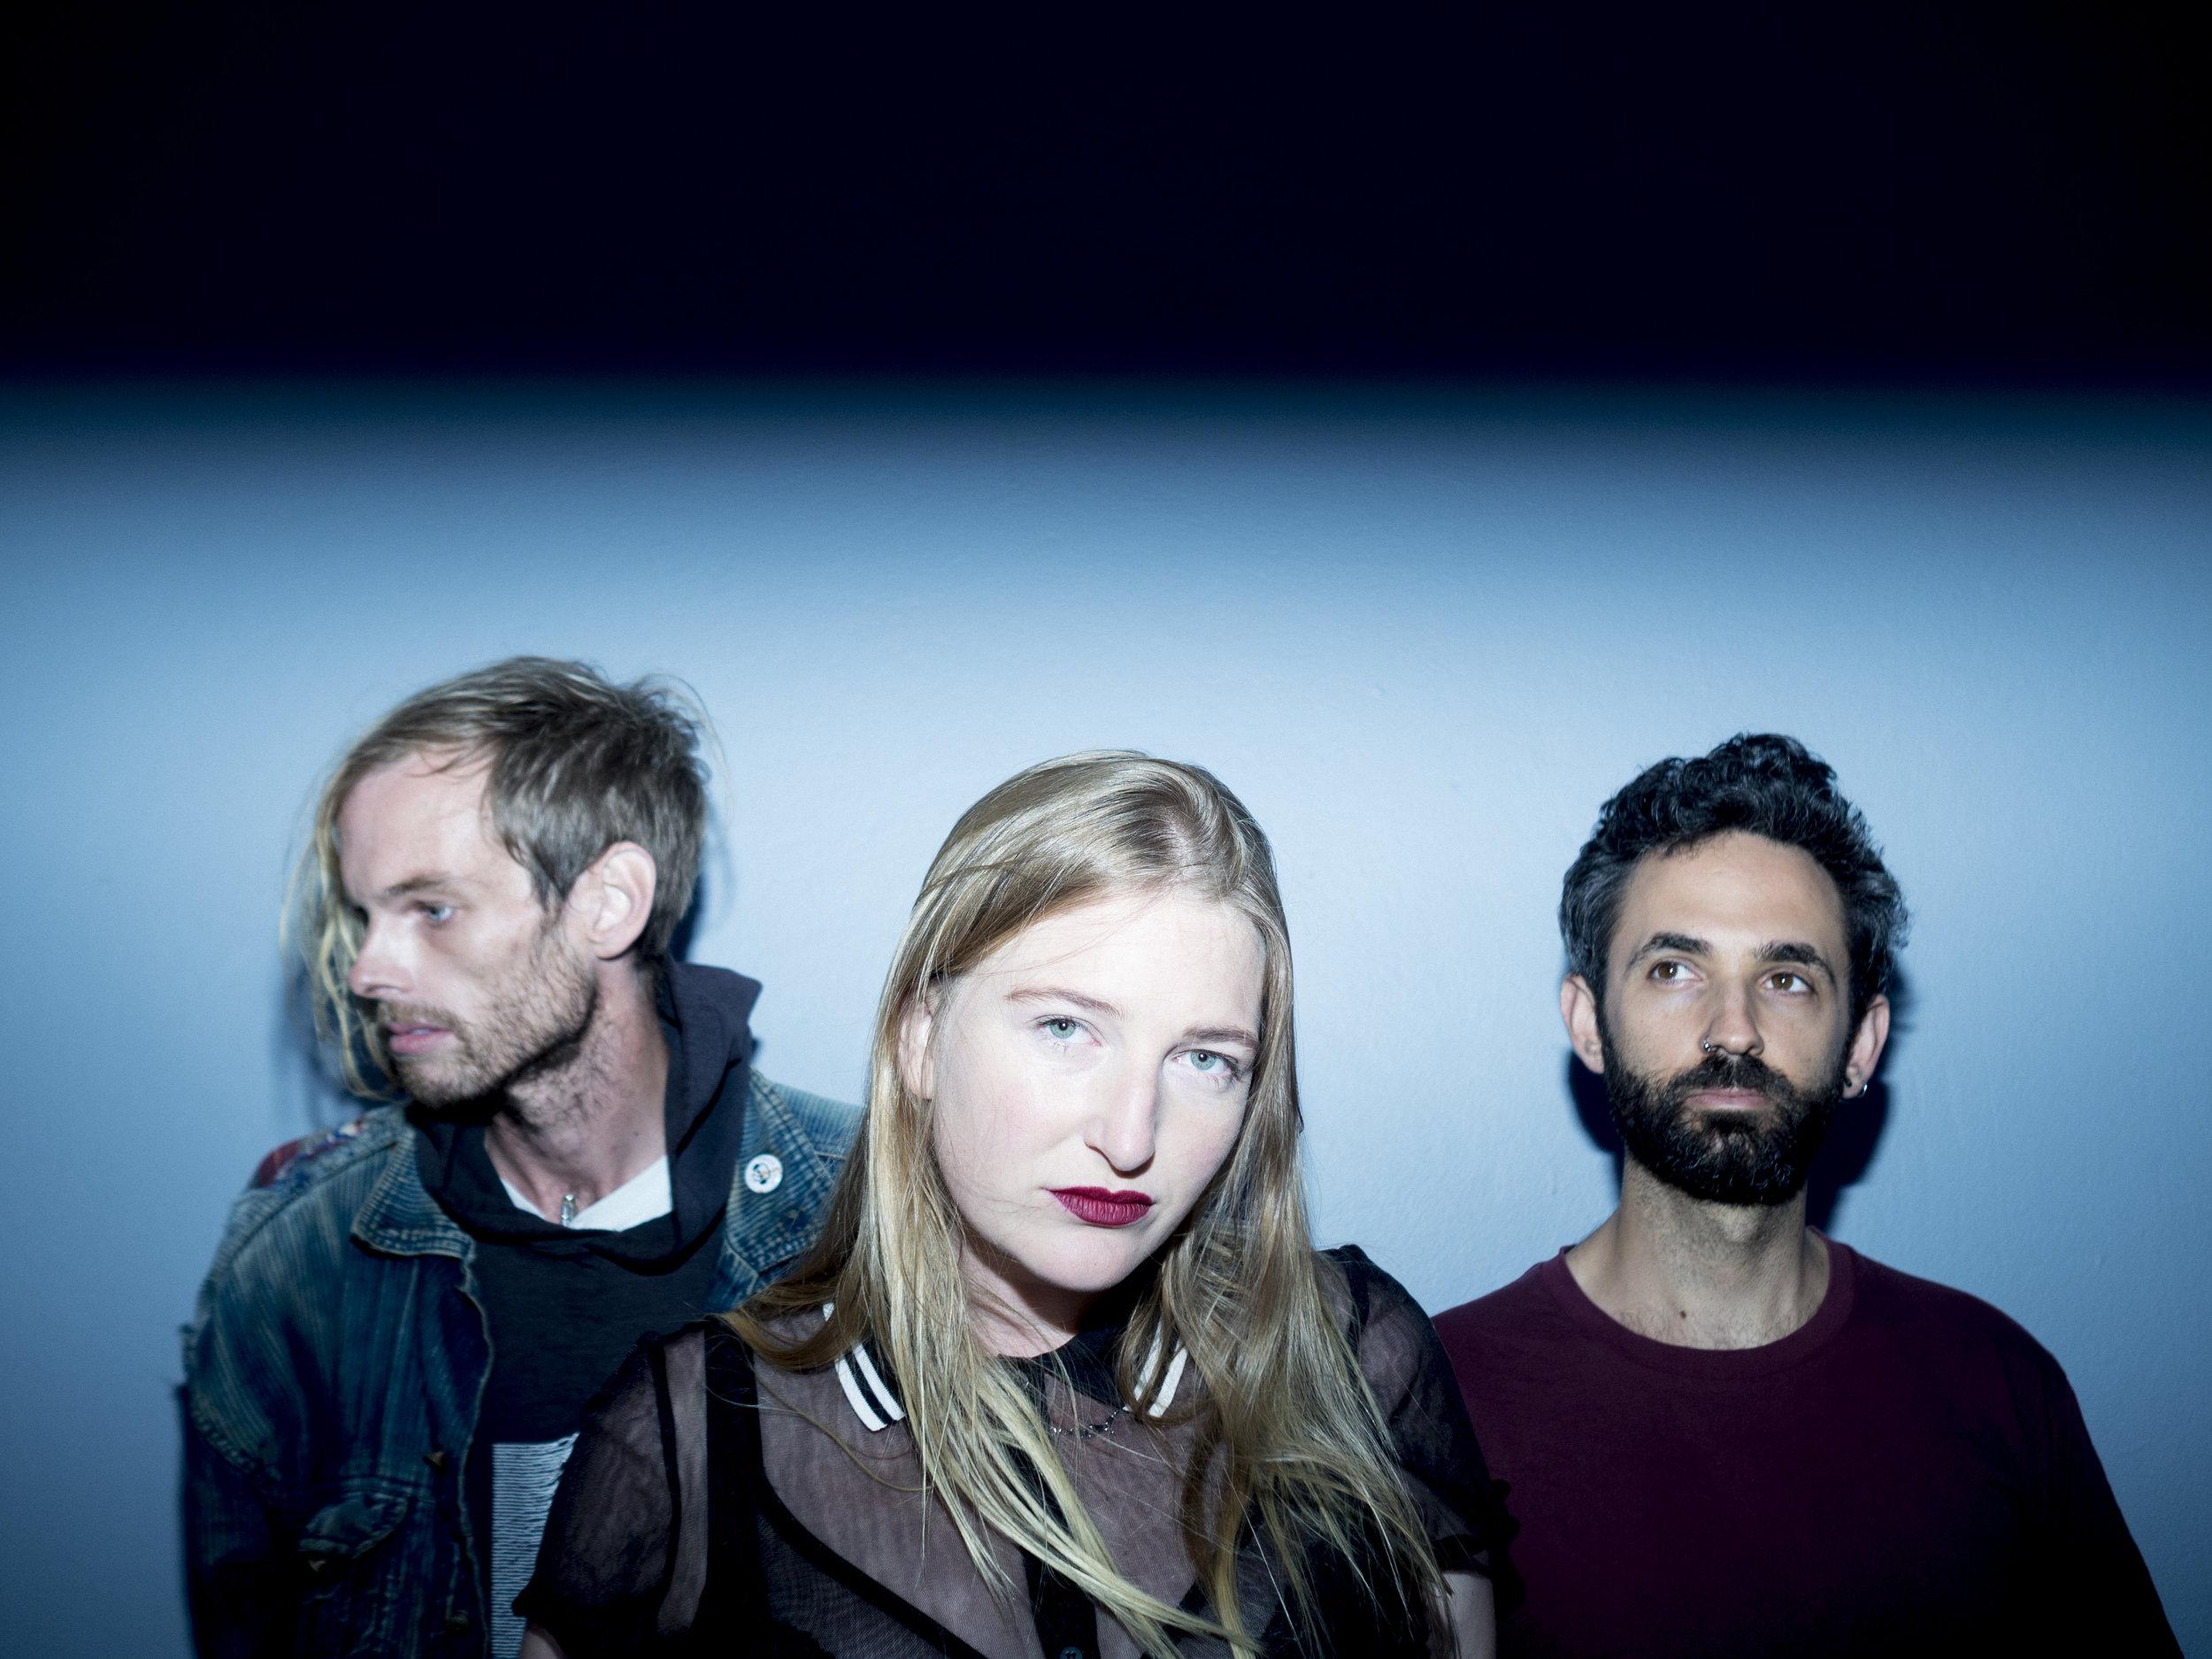 JuliaWhy_band-photographer-Rhea Caldwell-L-R-PeterBeringer(drummer), Julia Wylie (lead singer bassist), Caleb Jacobs (guitarist).jpg